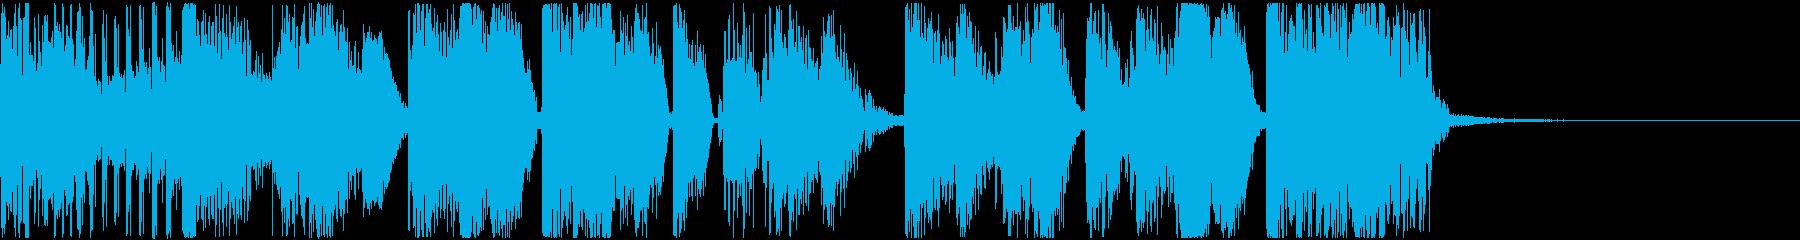 Glitch/Funk/Darkの再生済みの波形